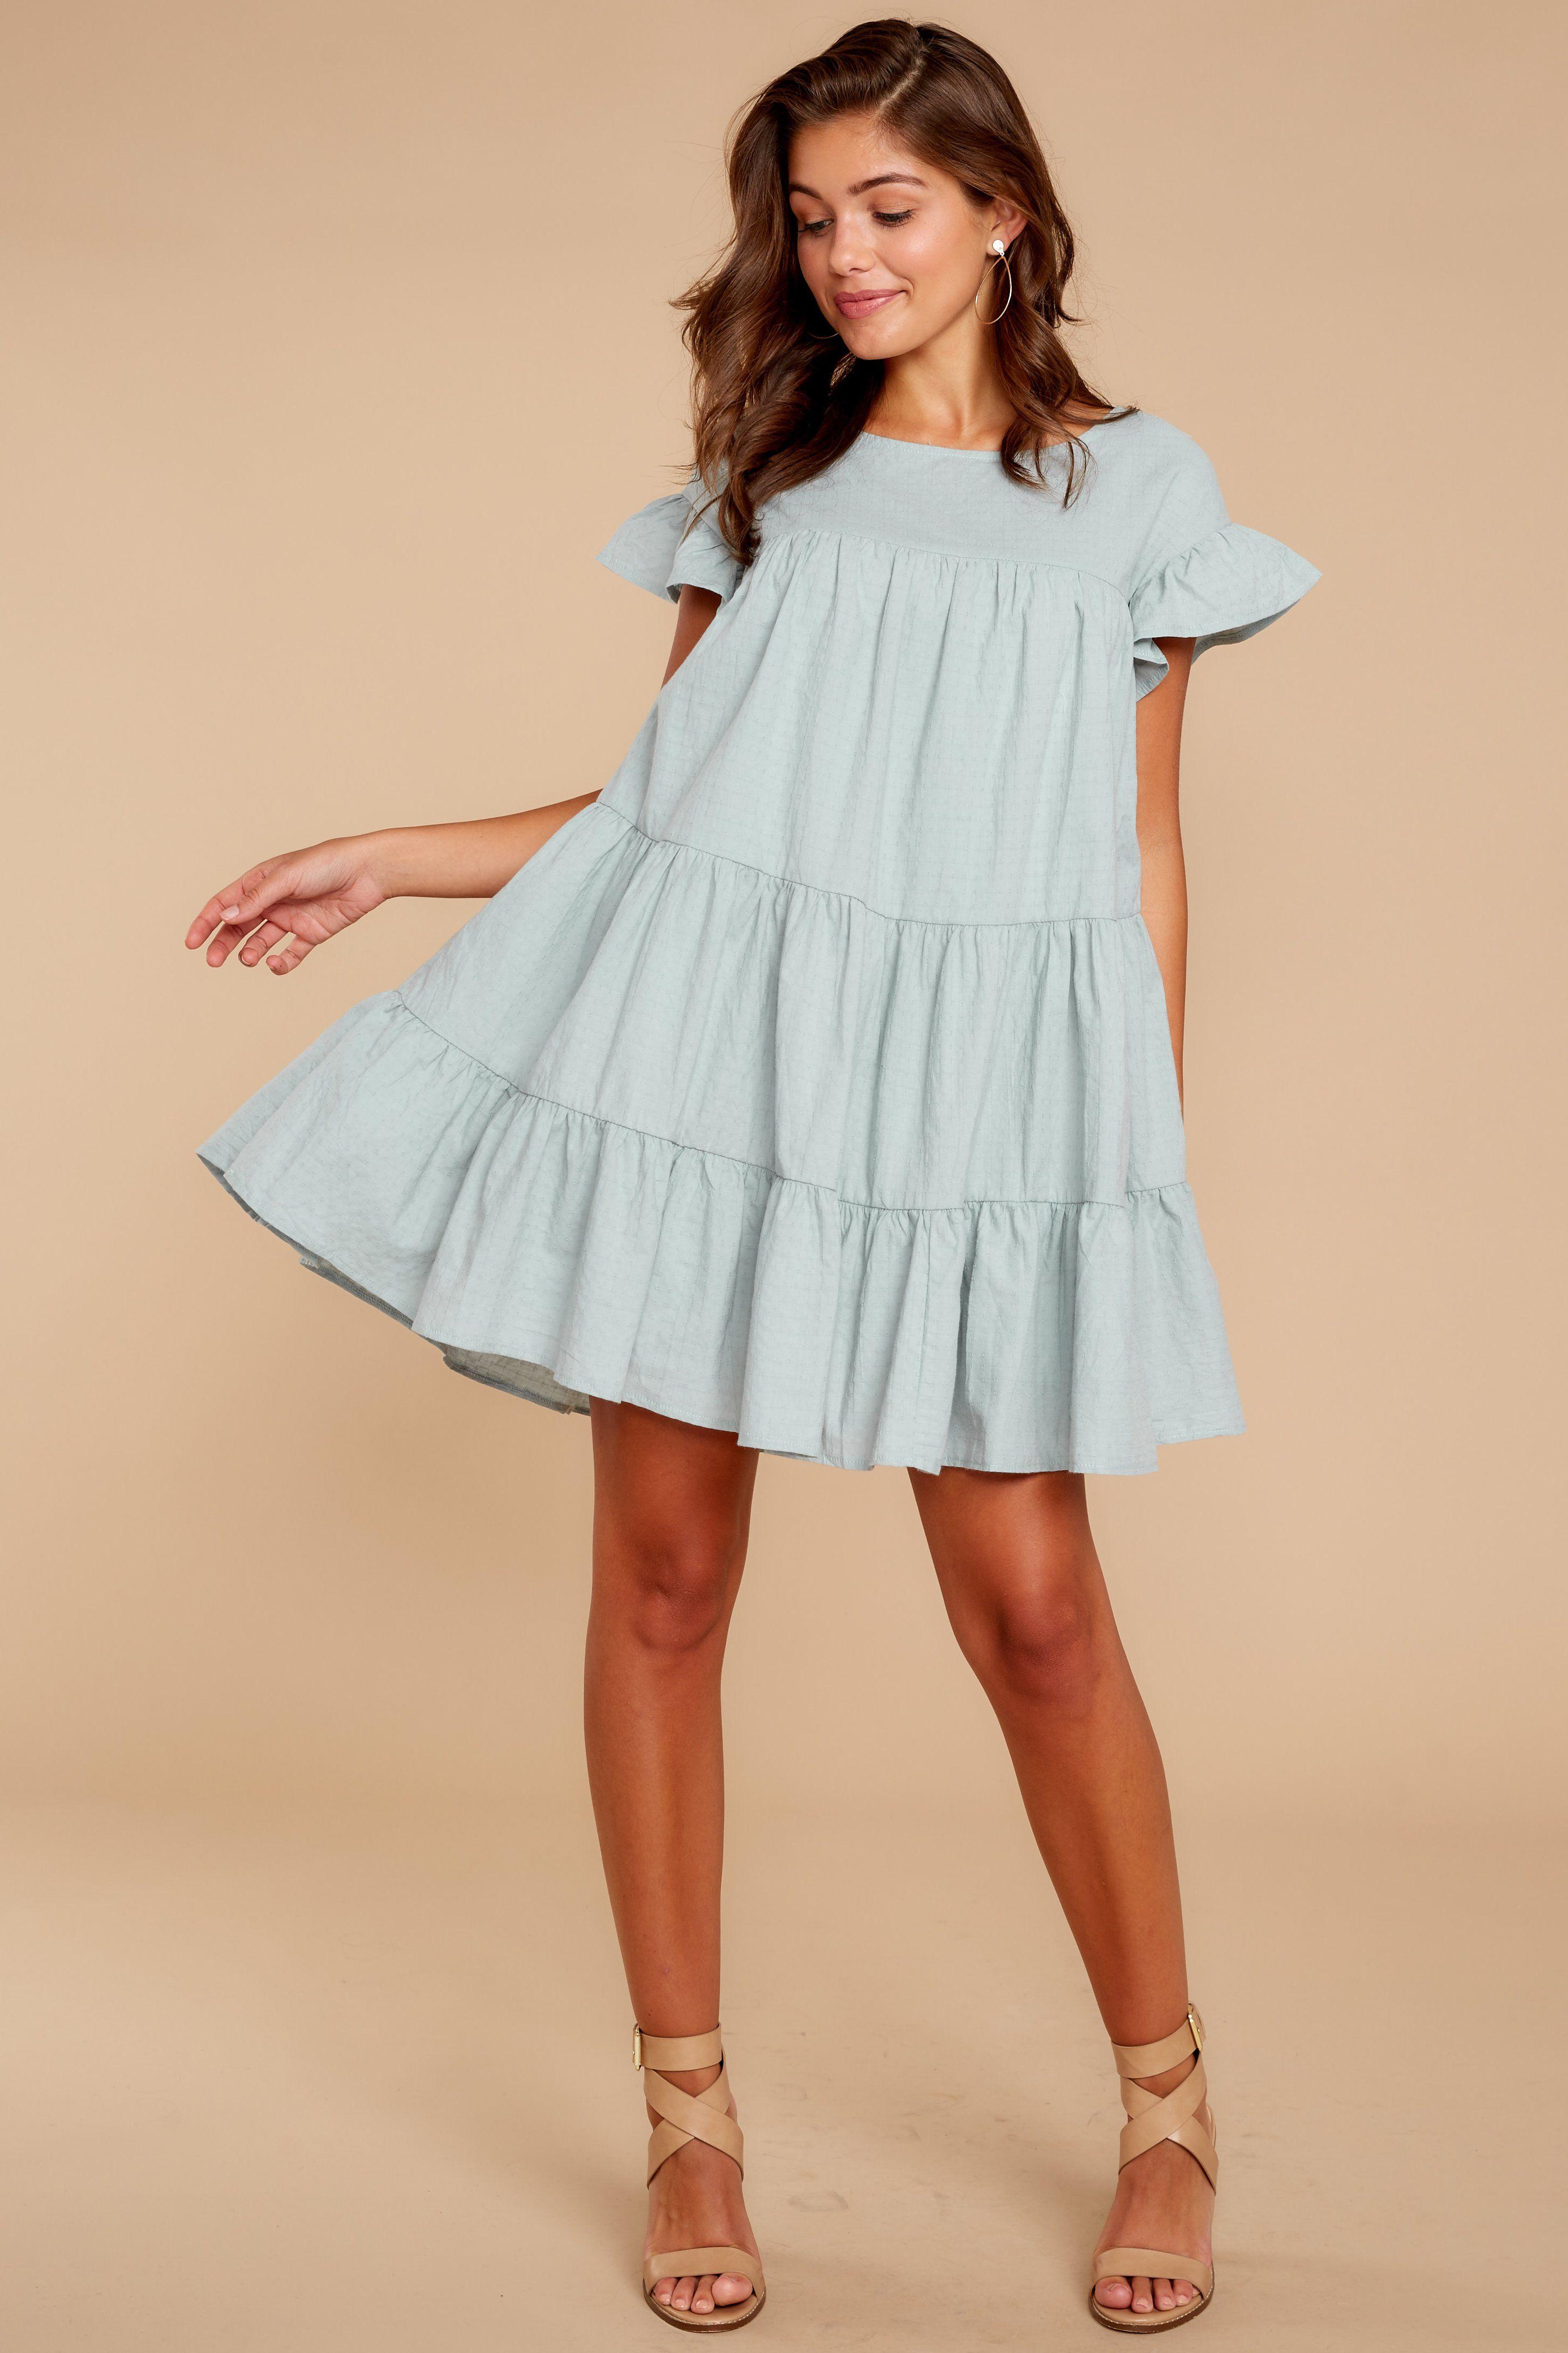 Chic Mint Dress - Baby Doll Dress - Dress - $6.6 – Red Dress